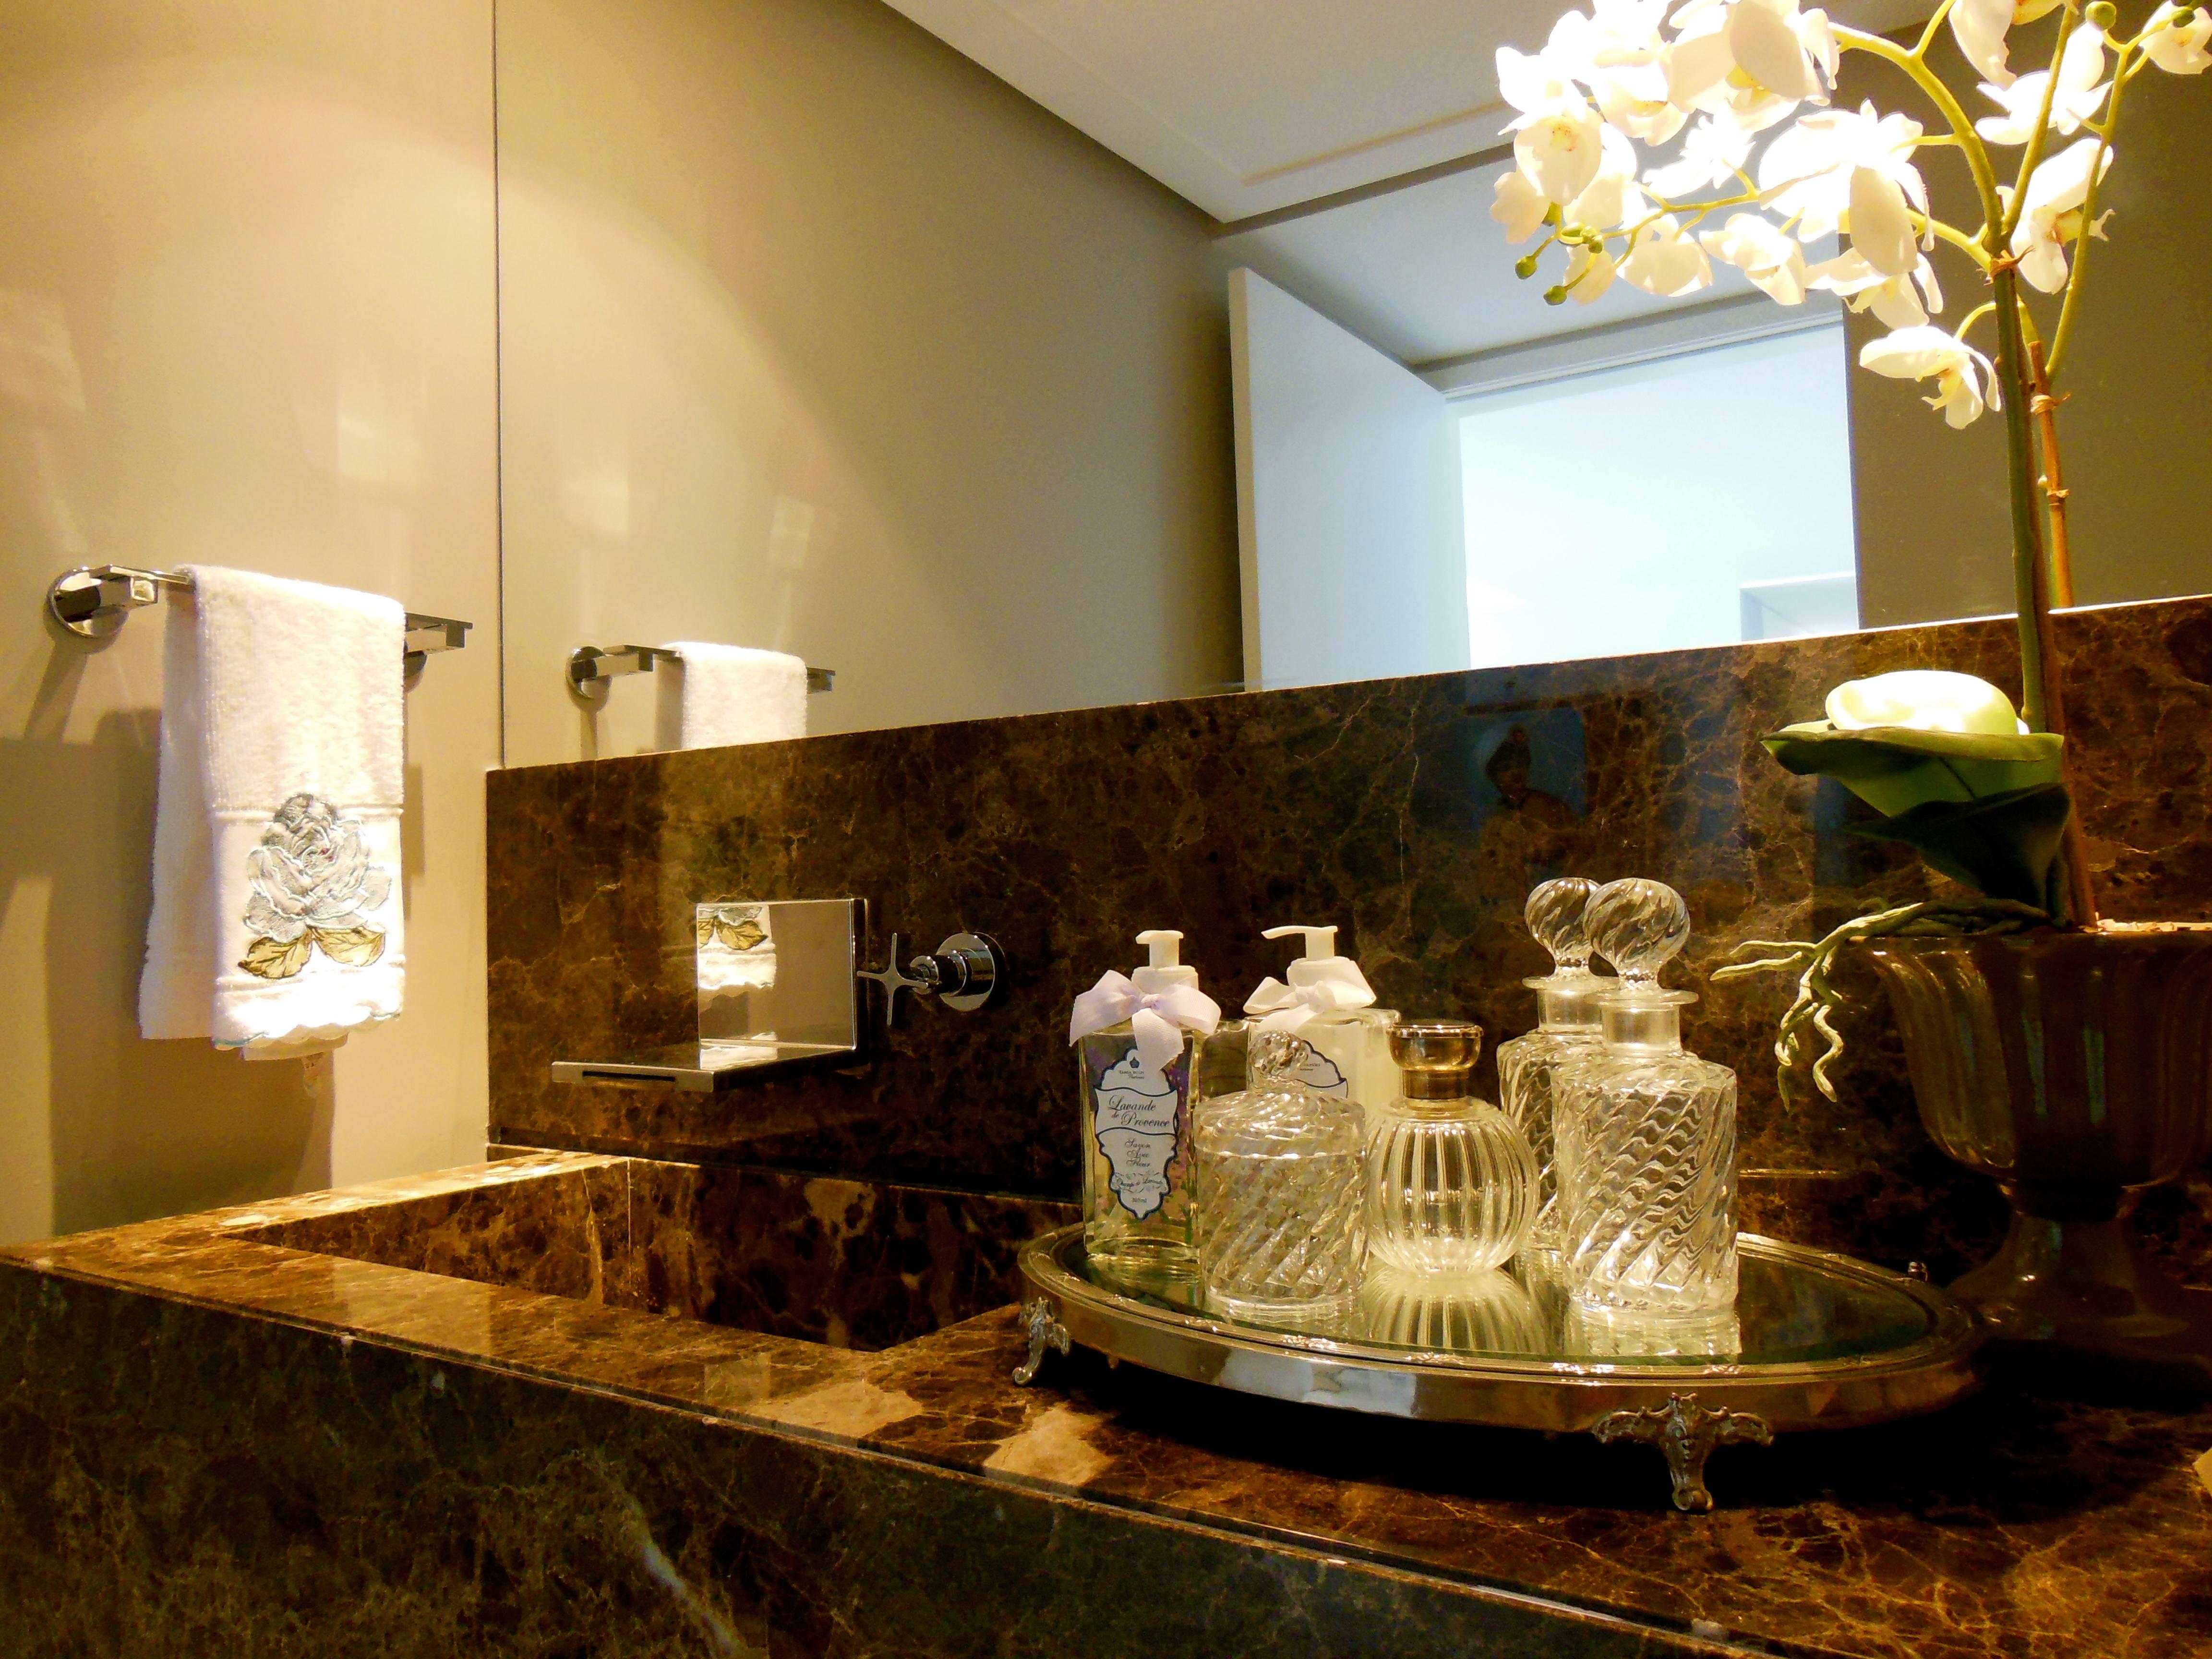 decoracao de lavabos antigos:Perfumeiros antigos flores e uma linda  #281503 4608 3456